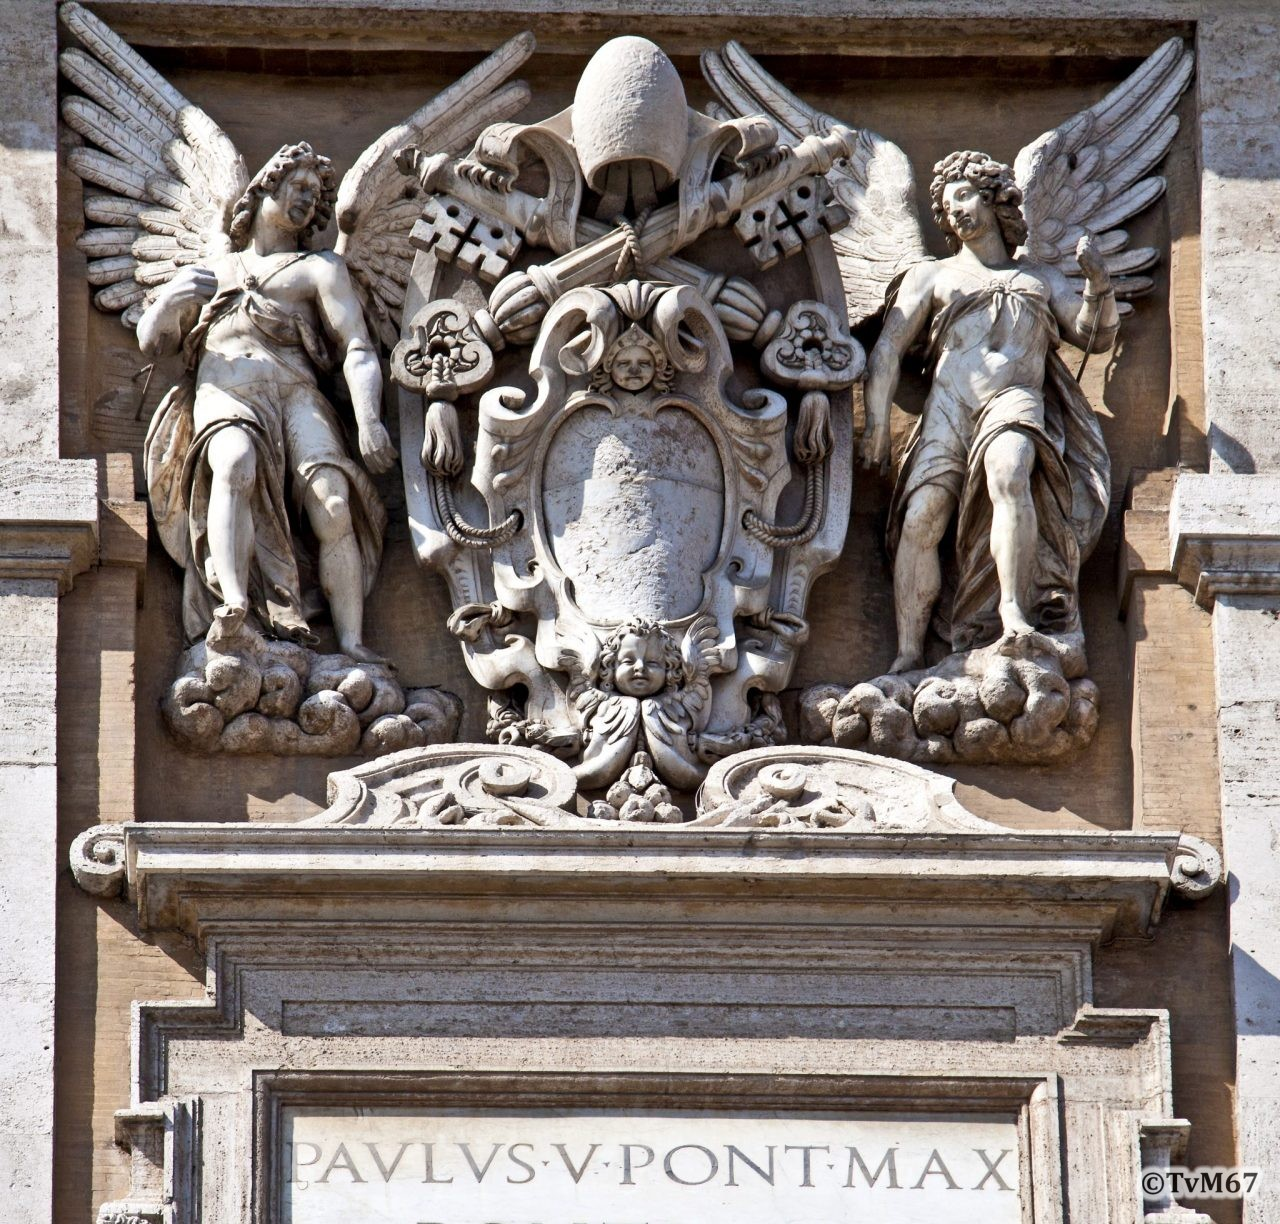 Basilica di Santa Maria Maggiore, Voorgevel, detail